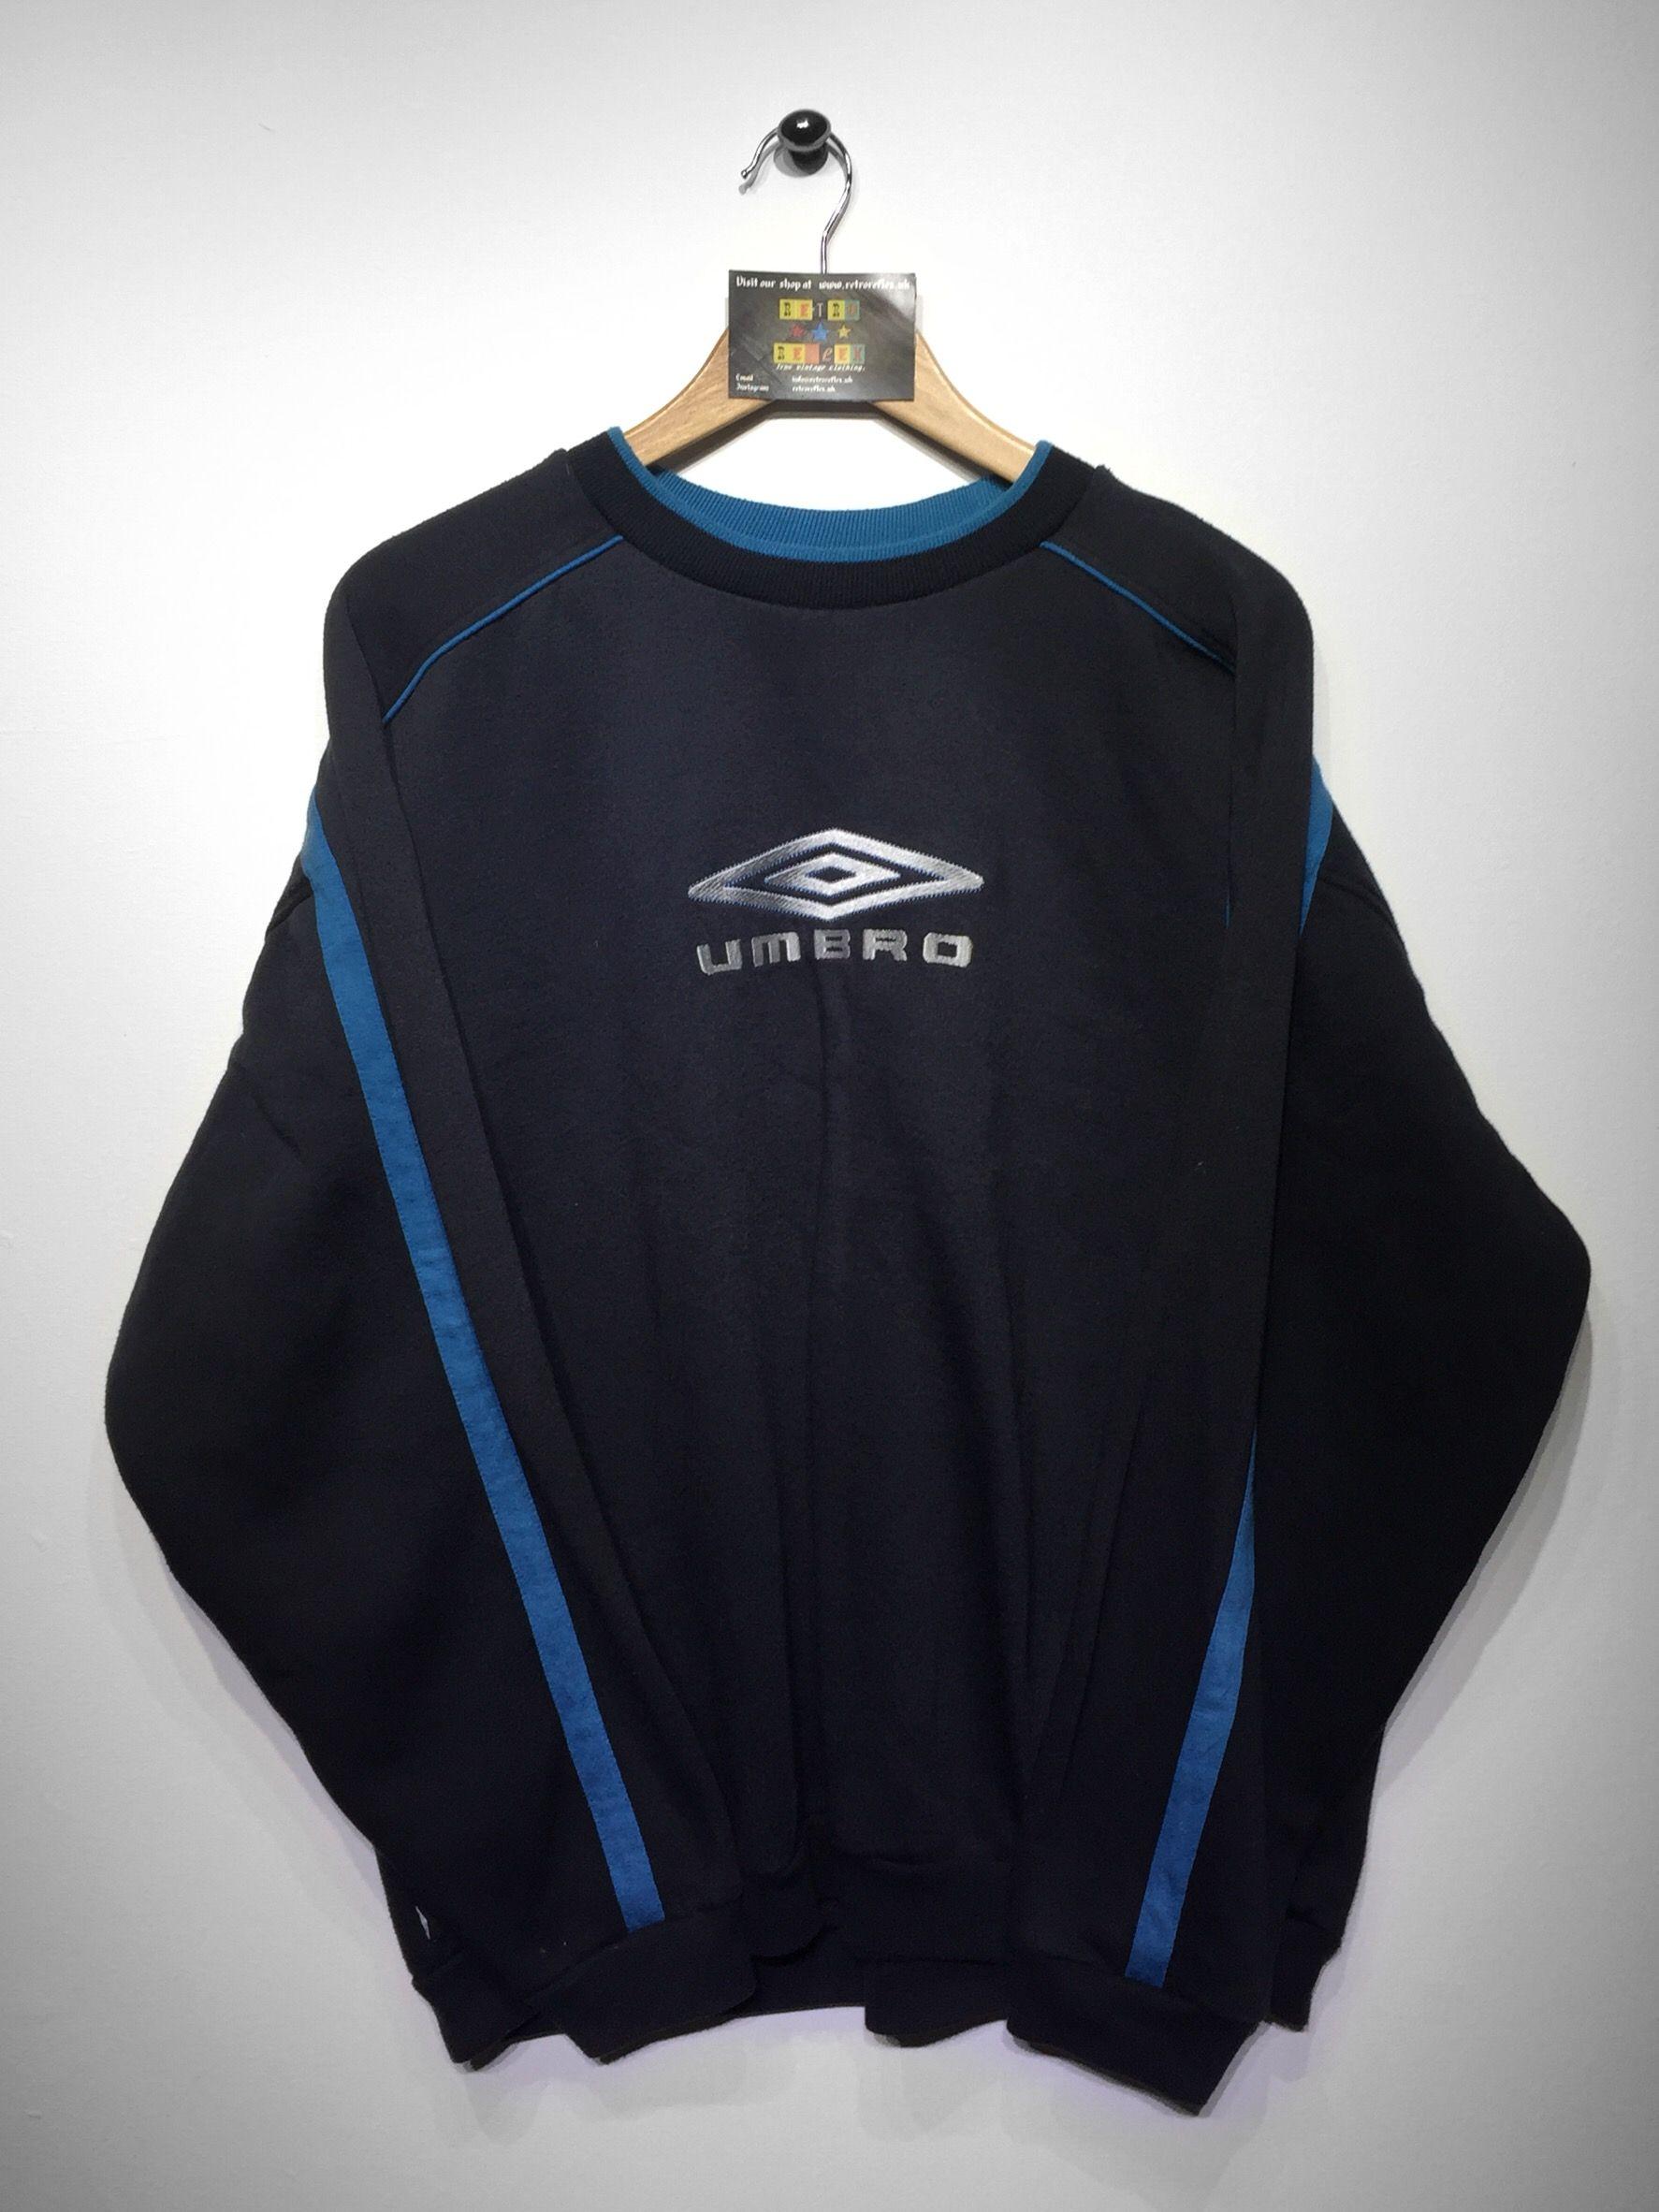 16c33e02a18 Umbro Sweatshirt Size X/Large(but Fits Oversized) £34 Website ...